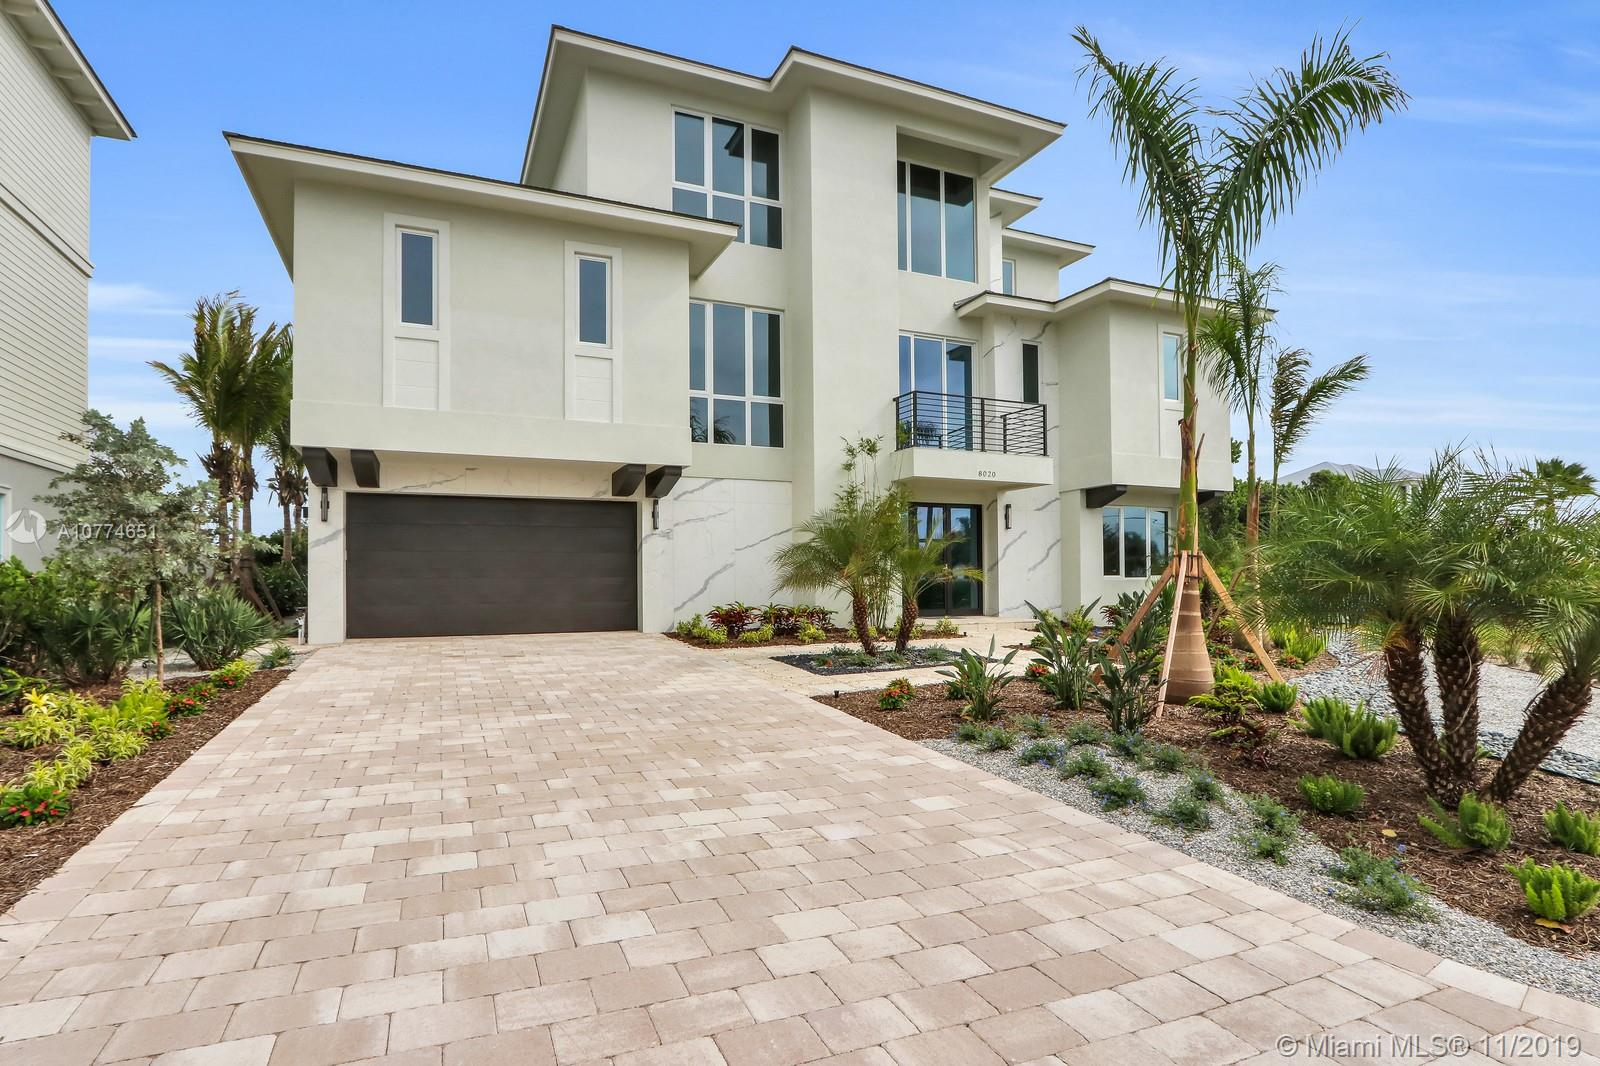 8020 S Ocean Dr, Jensen Beach, FL 34957